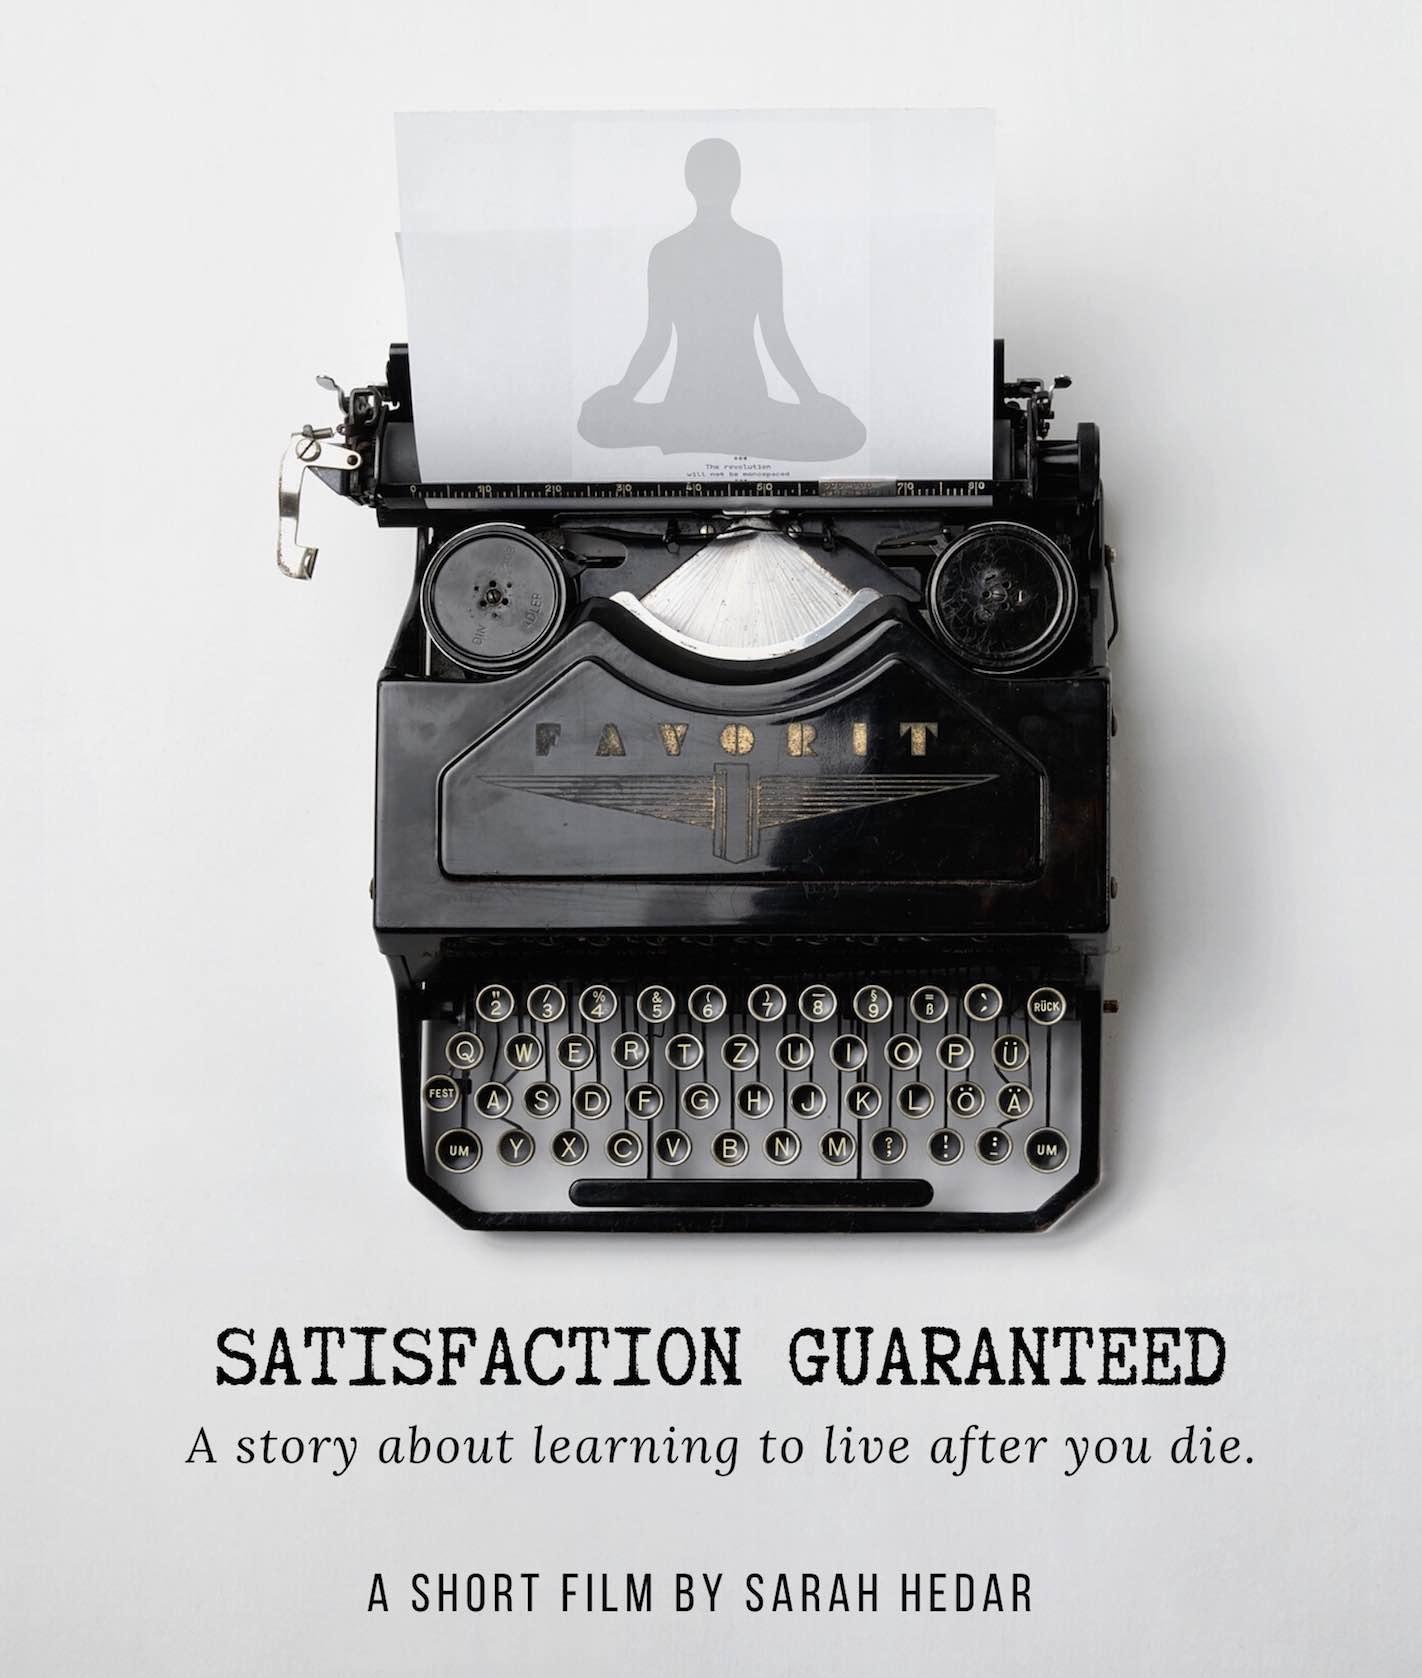 Temp poster image for Satisfaction Guaranteed